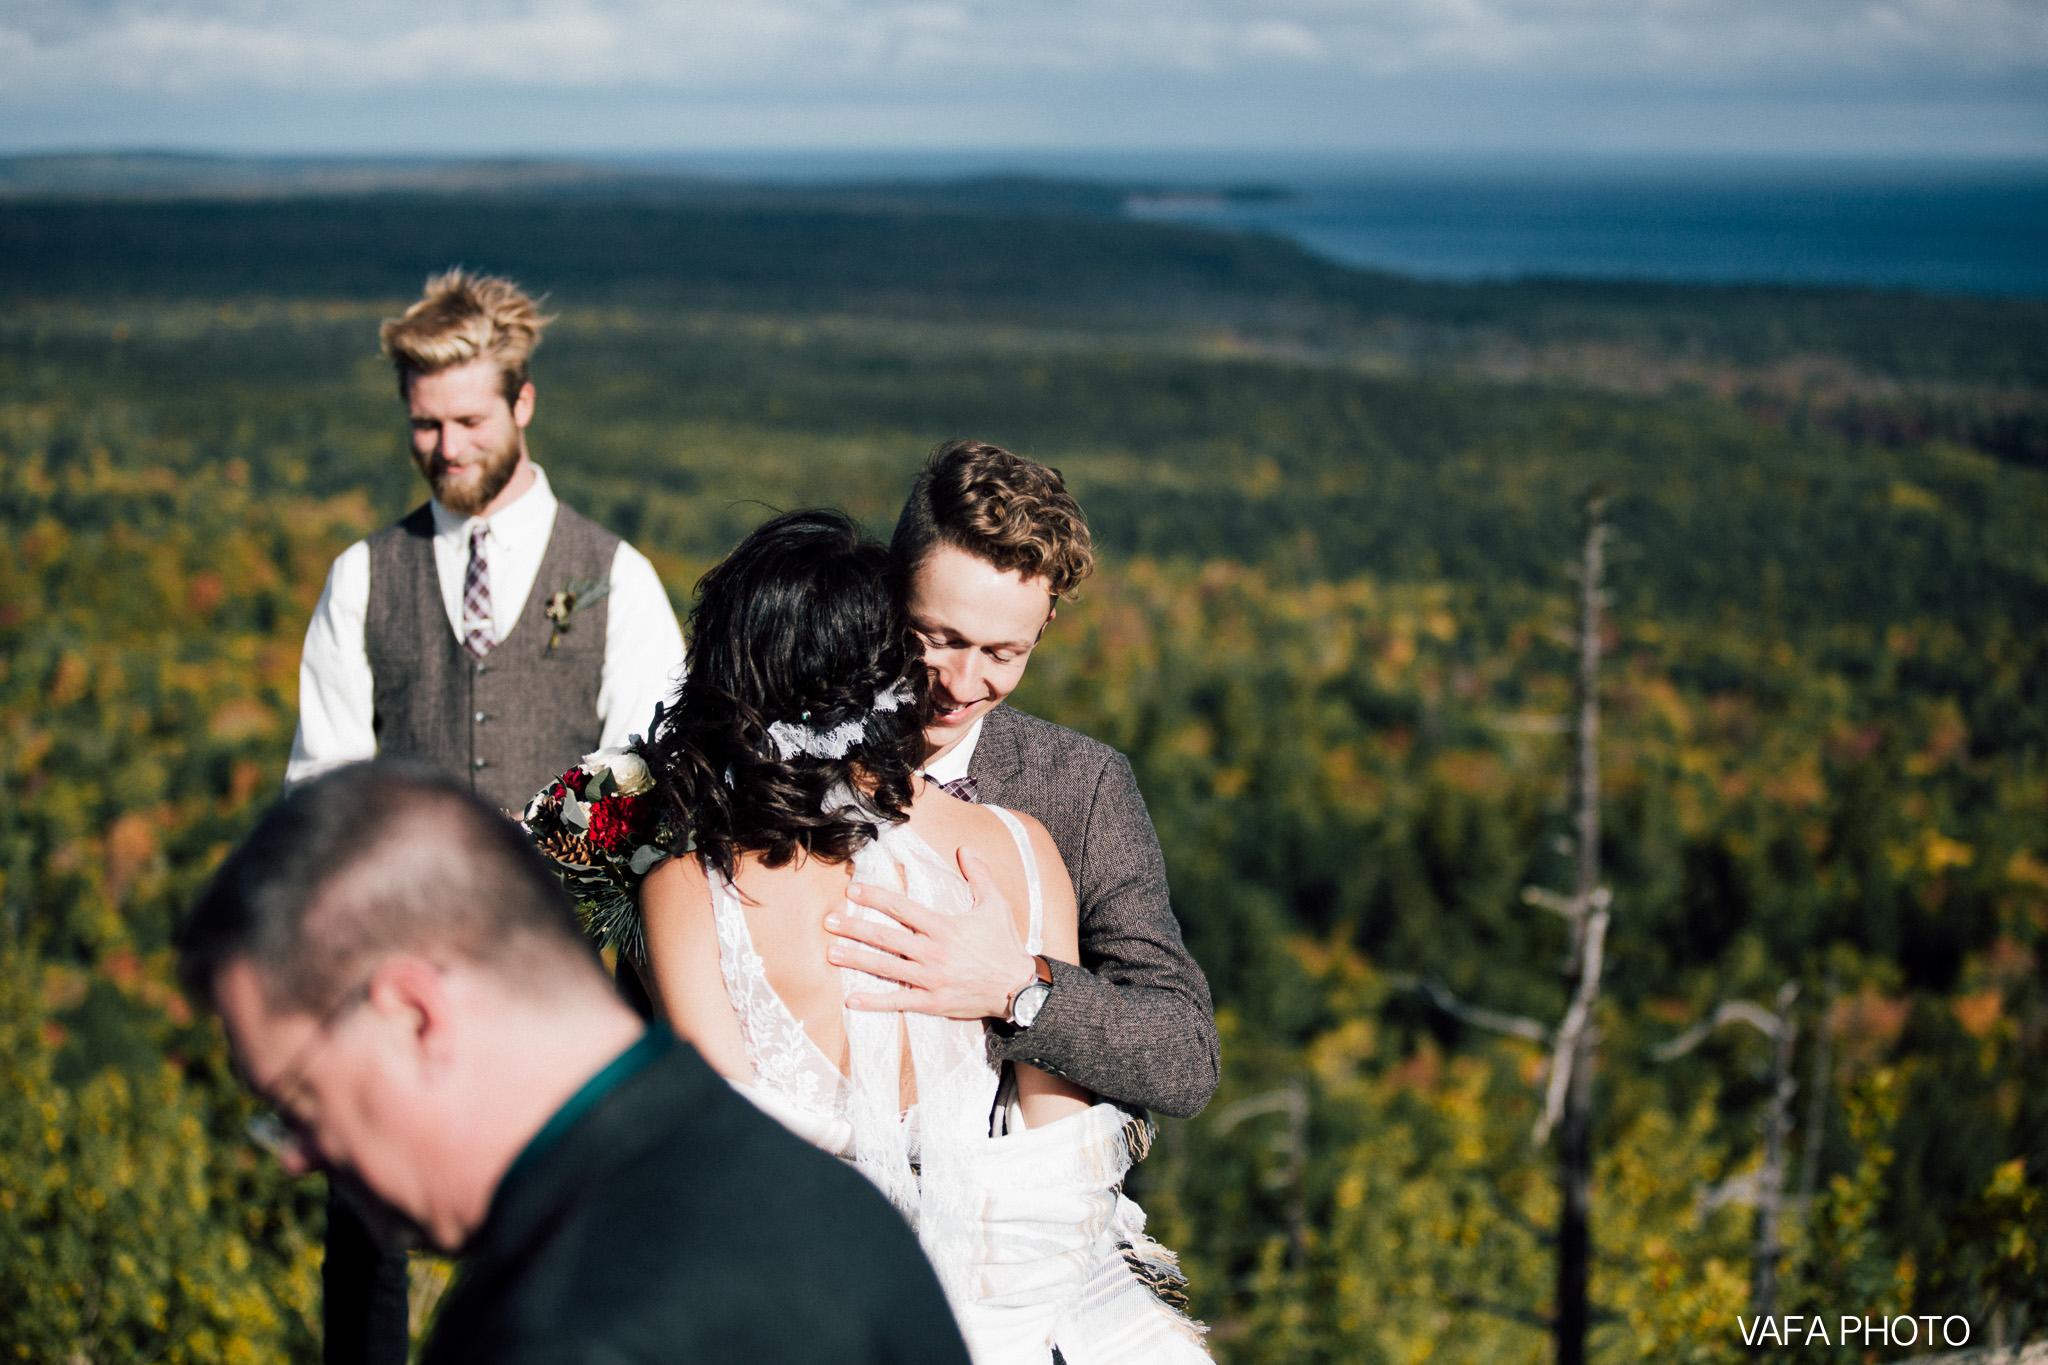 Hogback-Mountain-Wedding-Chelsea-Josh-Vafa-Photo-192.jpg